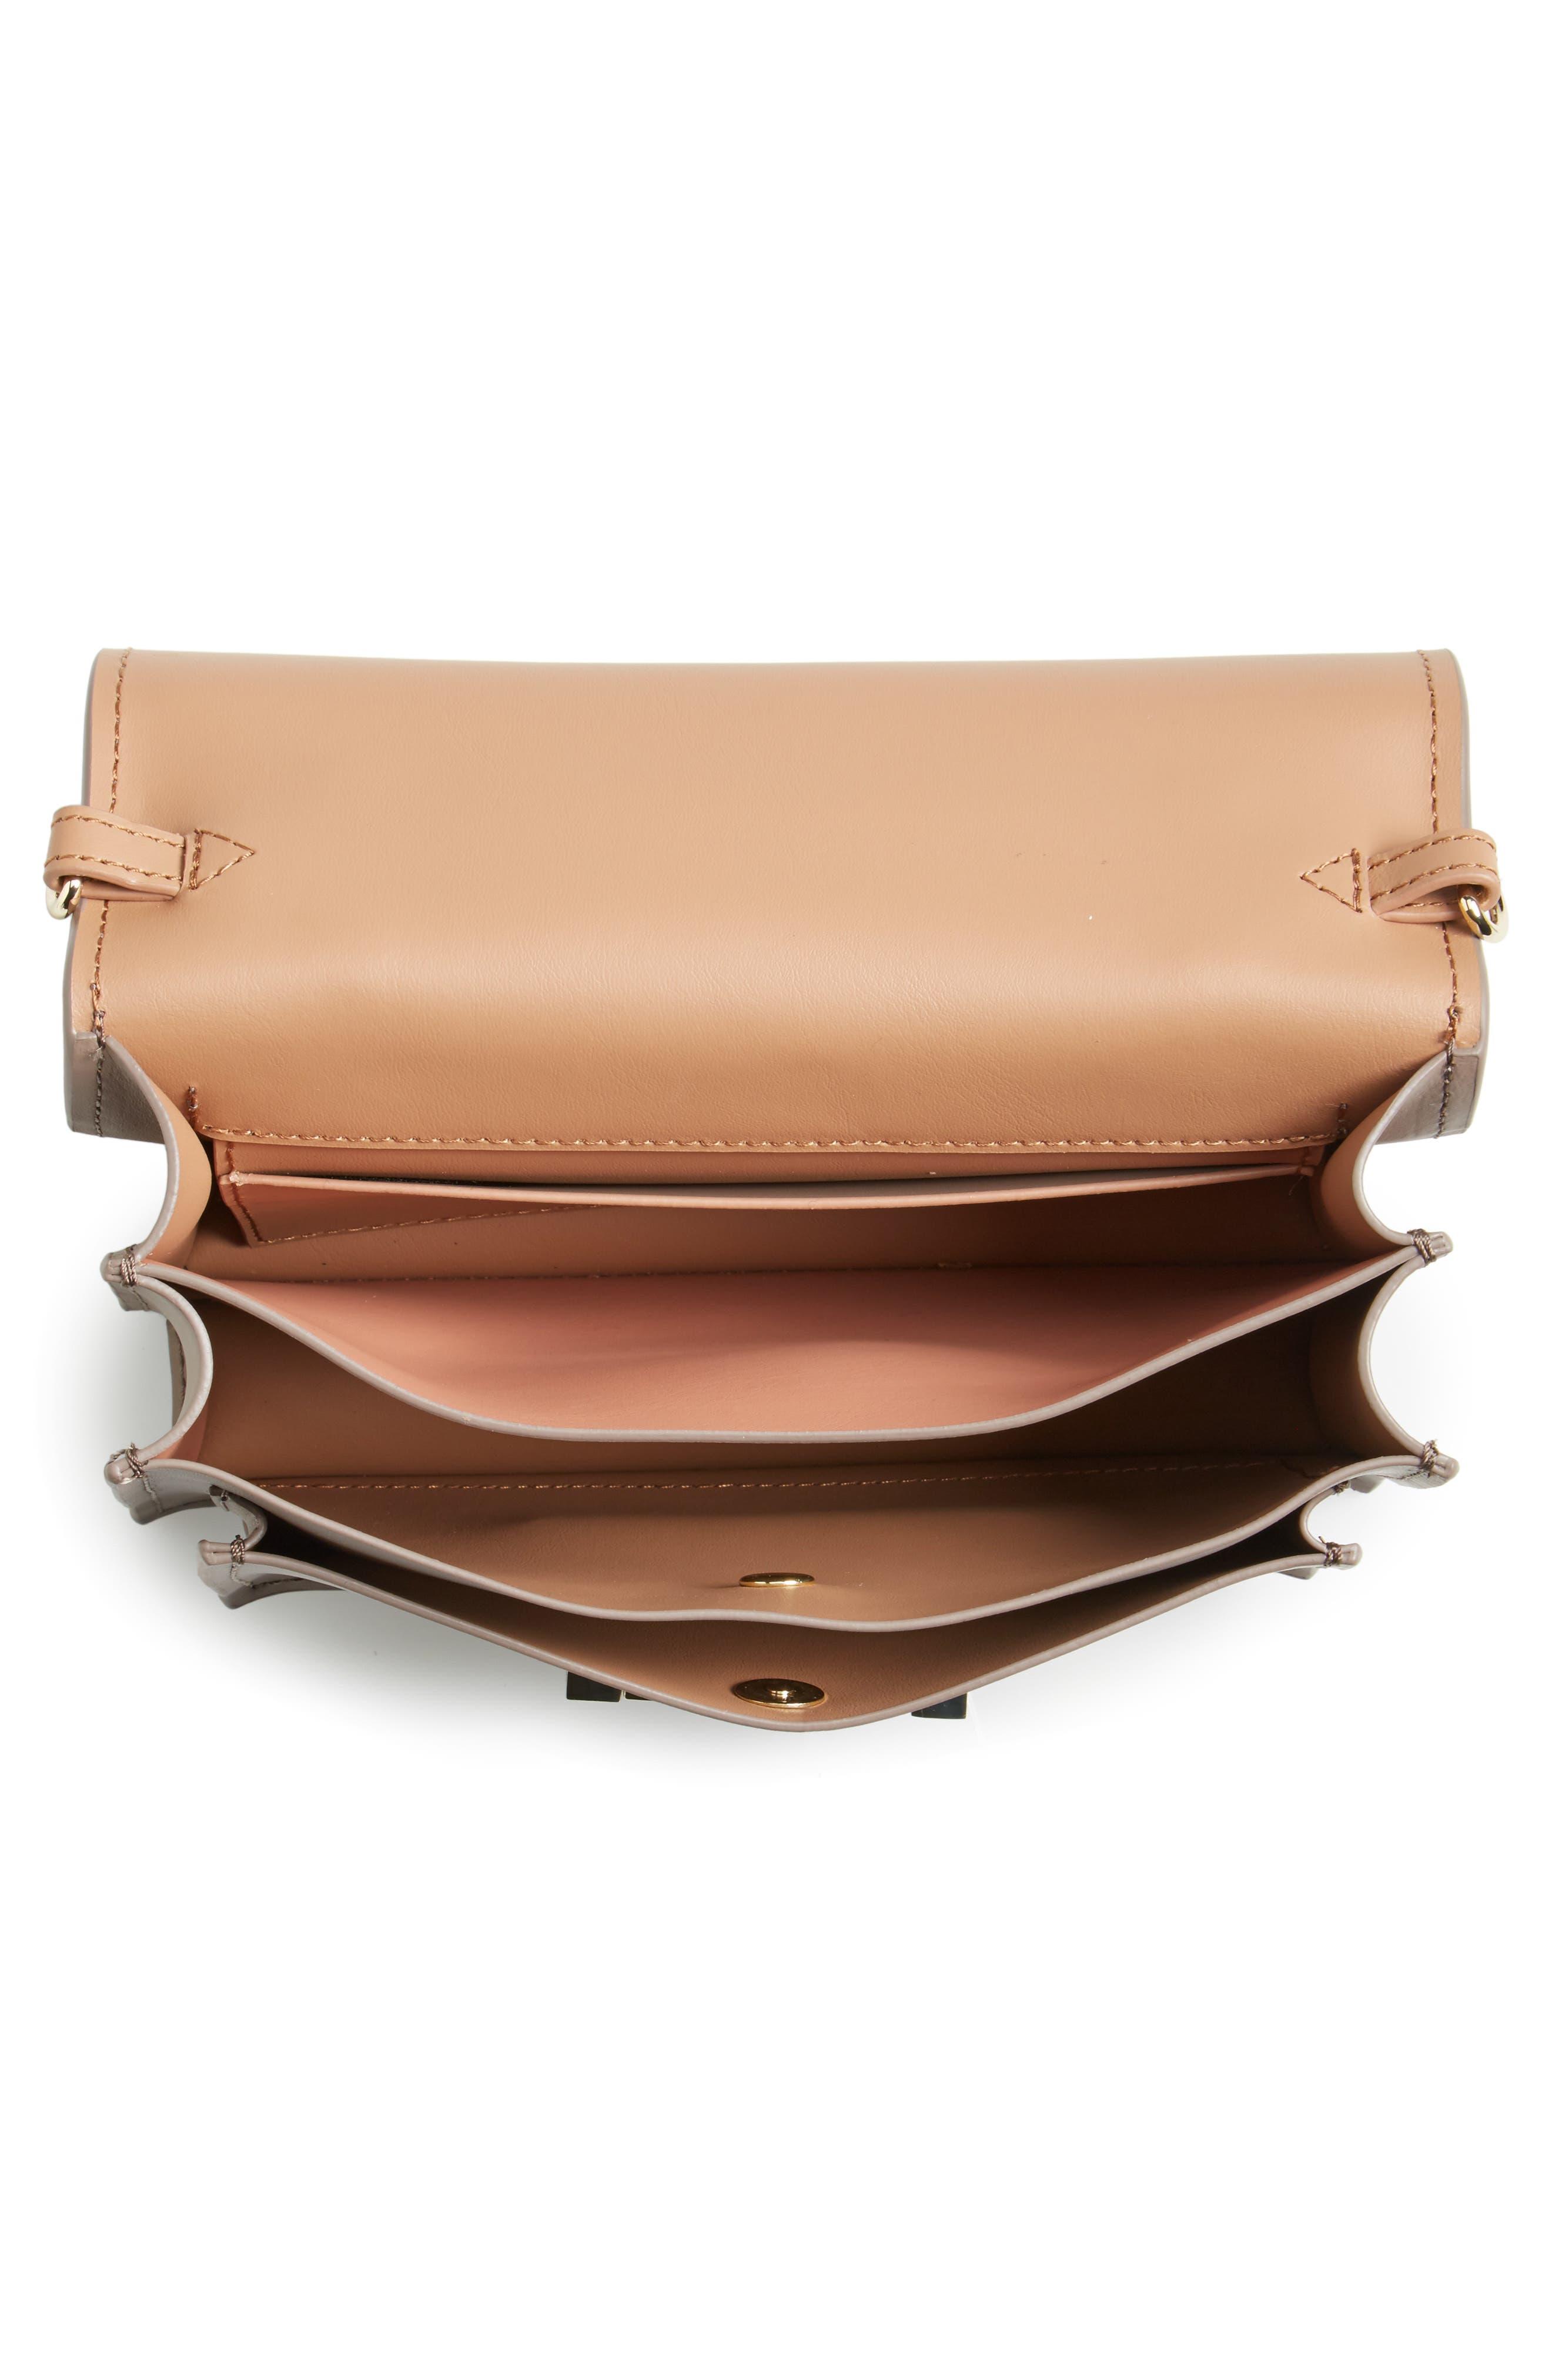 Alternate Image 3  - ZAC Zac Posen Earthette Leather Accordion Bag